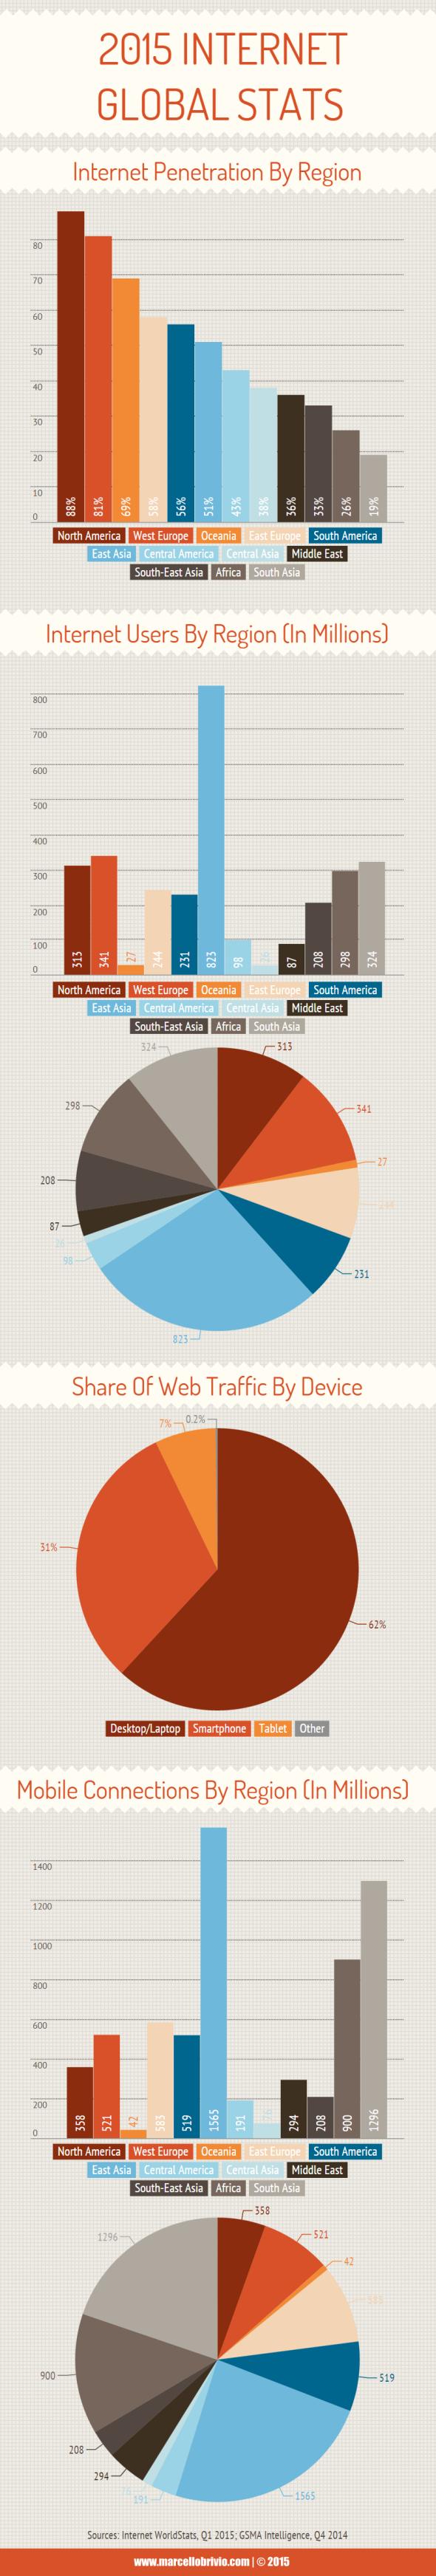 Internet Global Stats